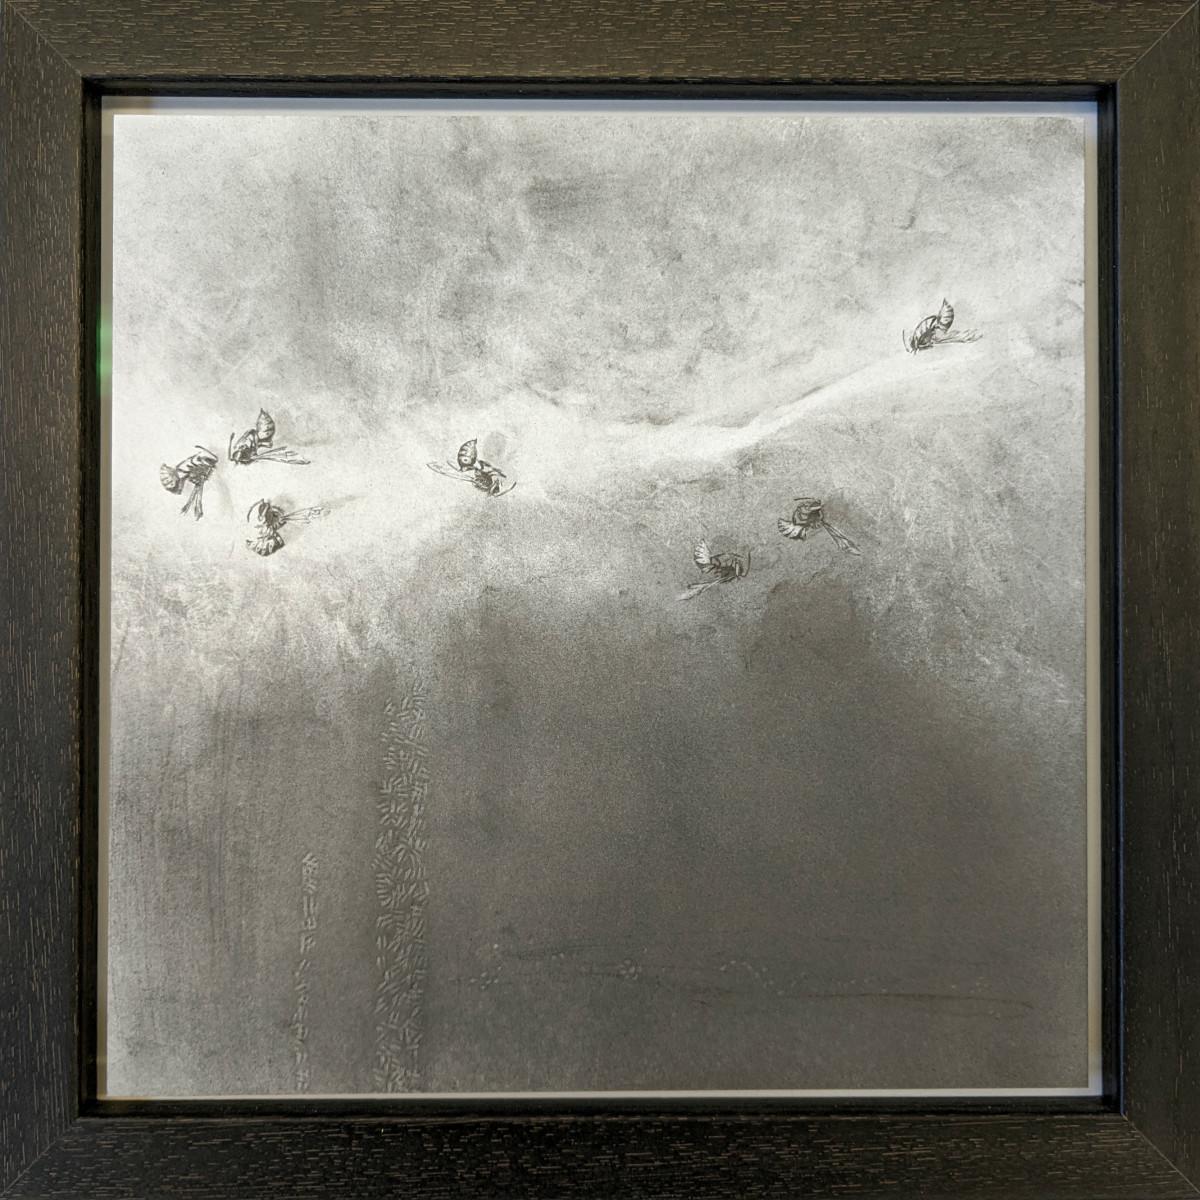 FlightPath xxxxxii (lii) by Louisa Crispin